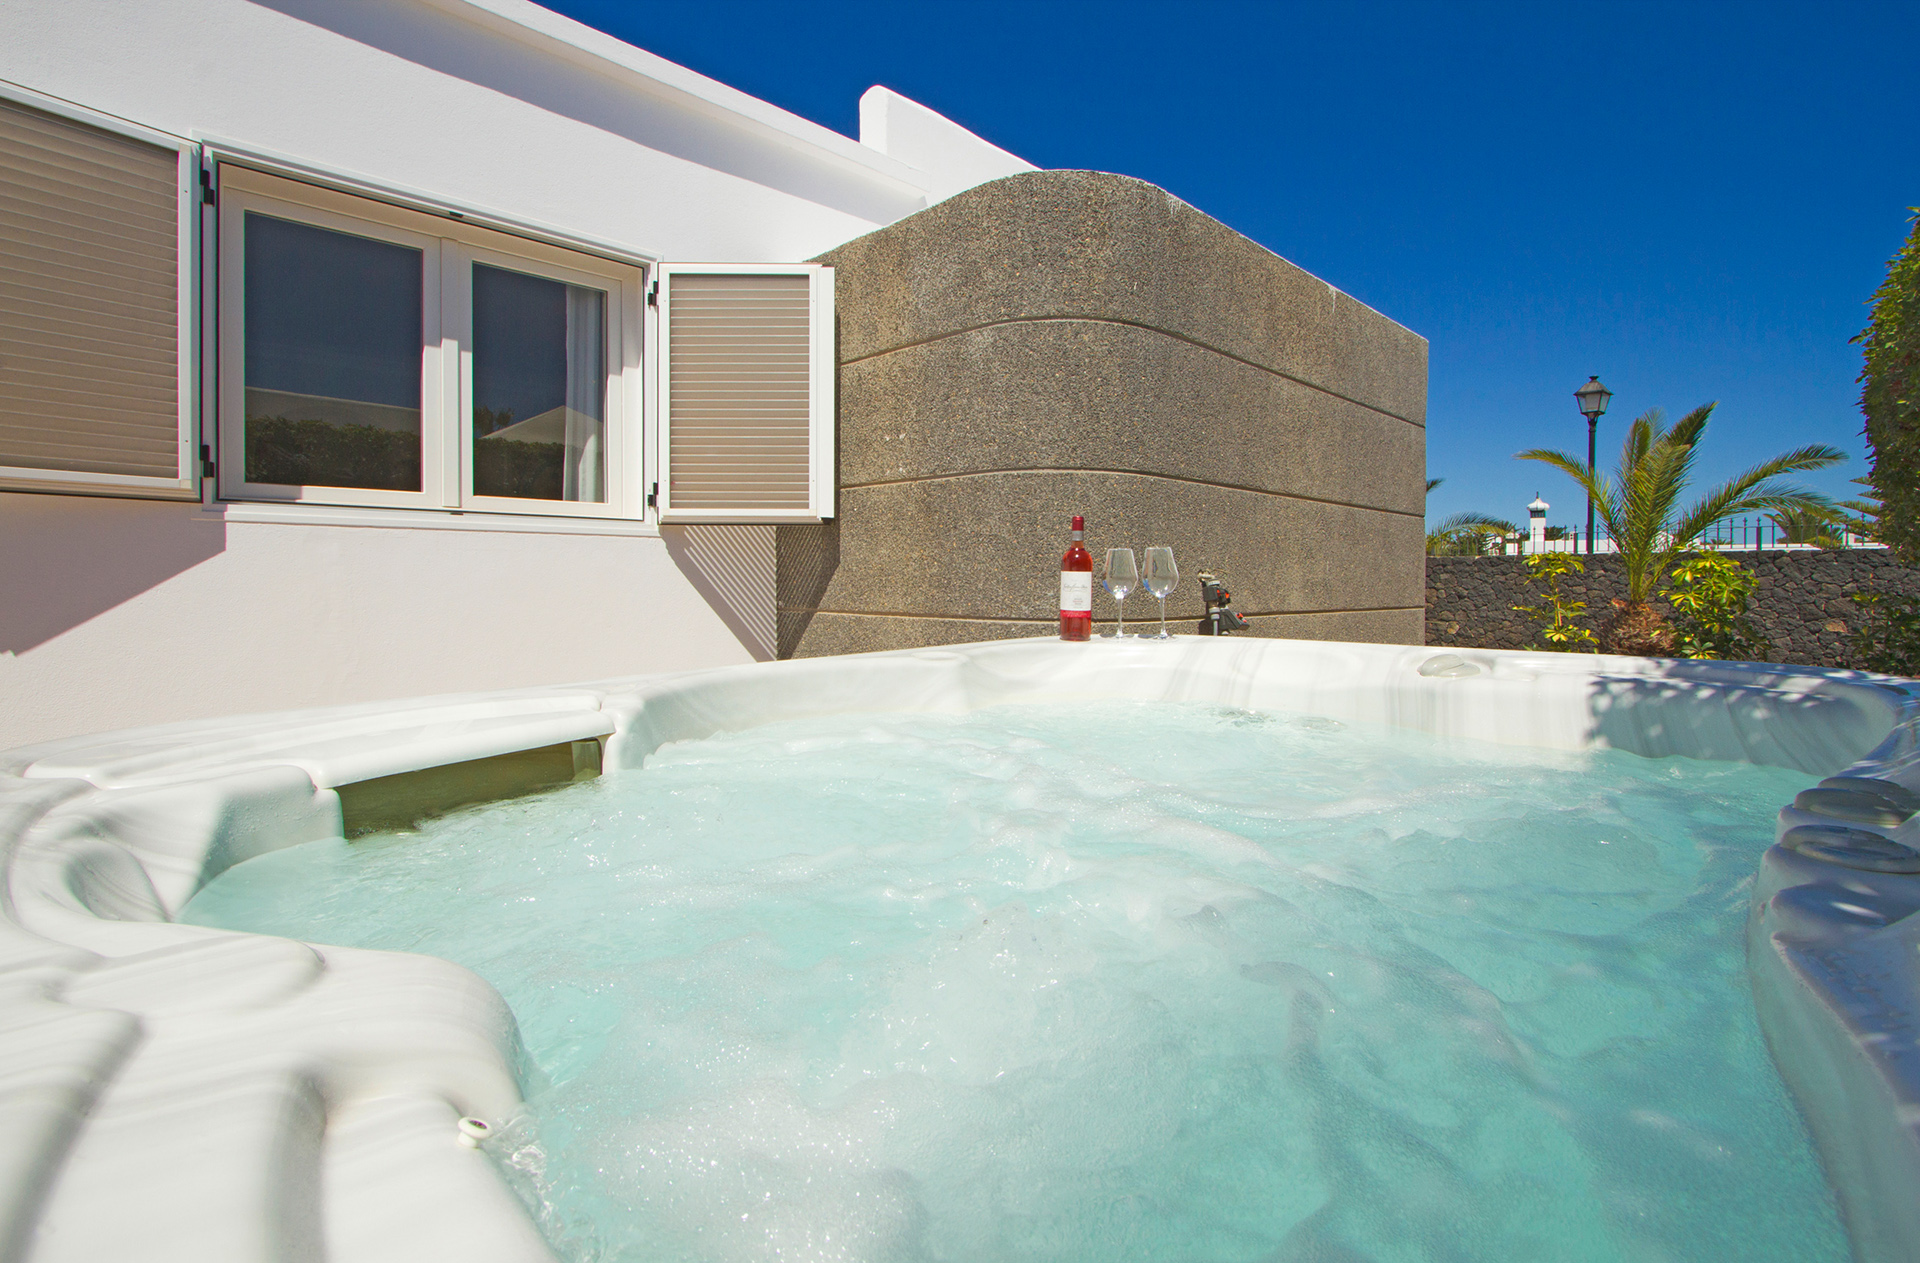 Ferienhaus Lanzarote Whirlpool 1